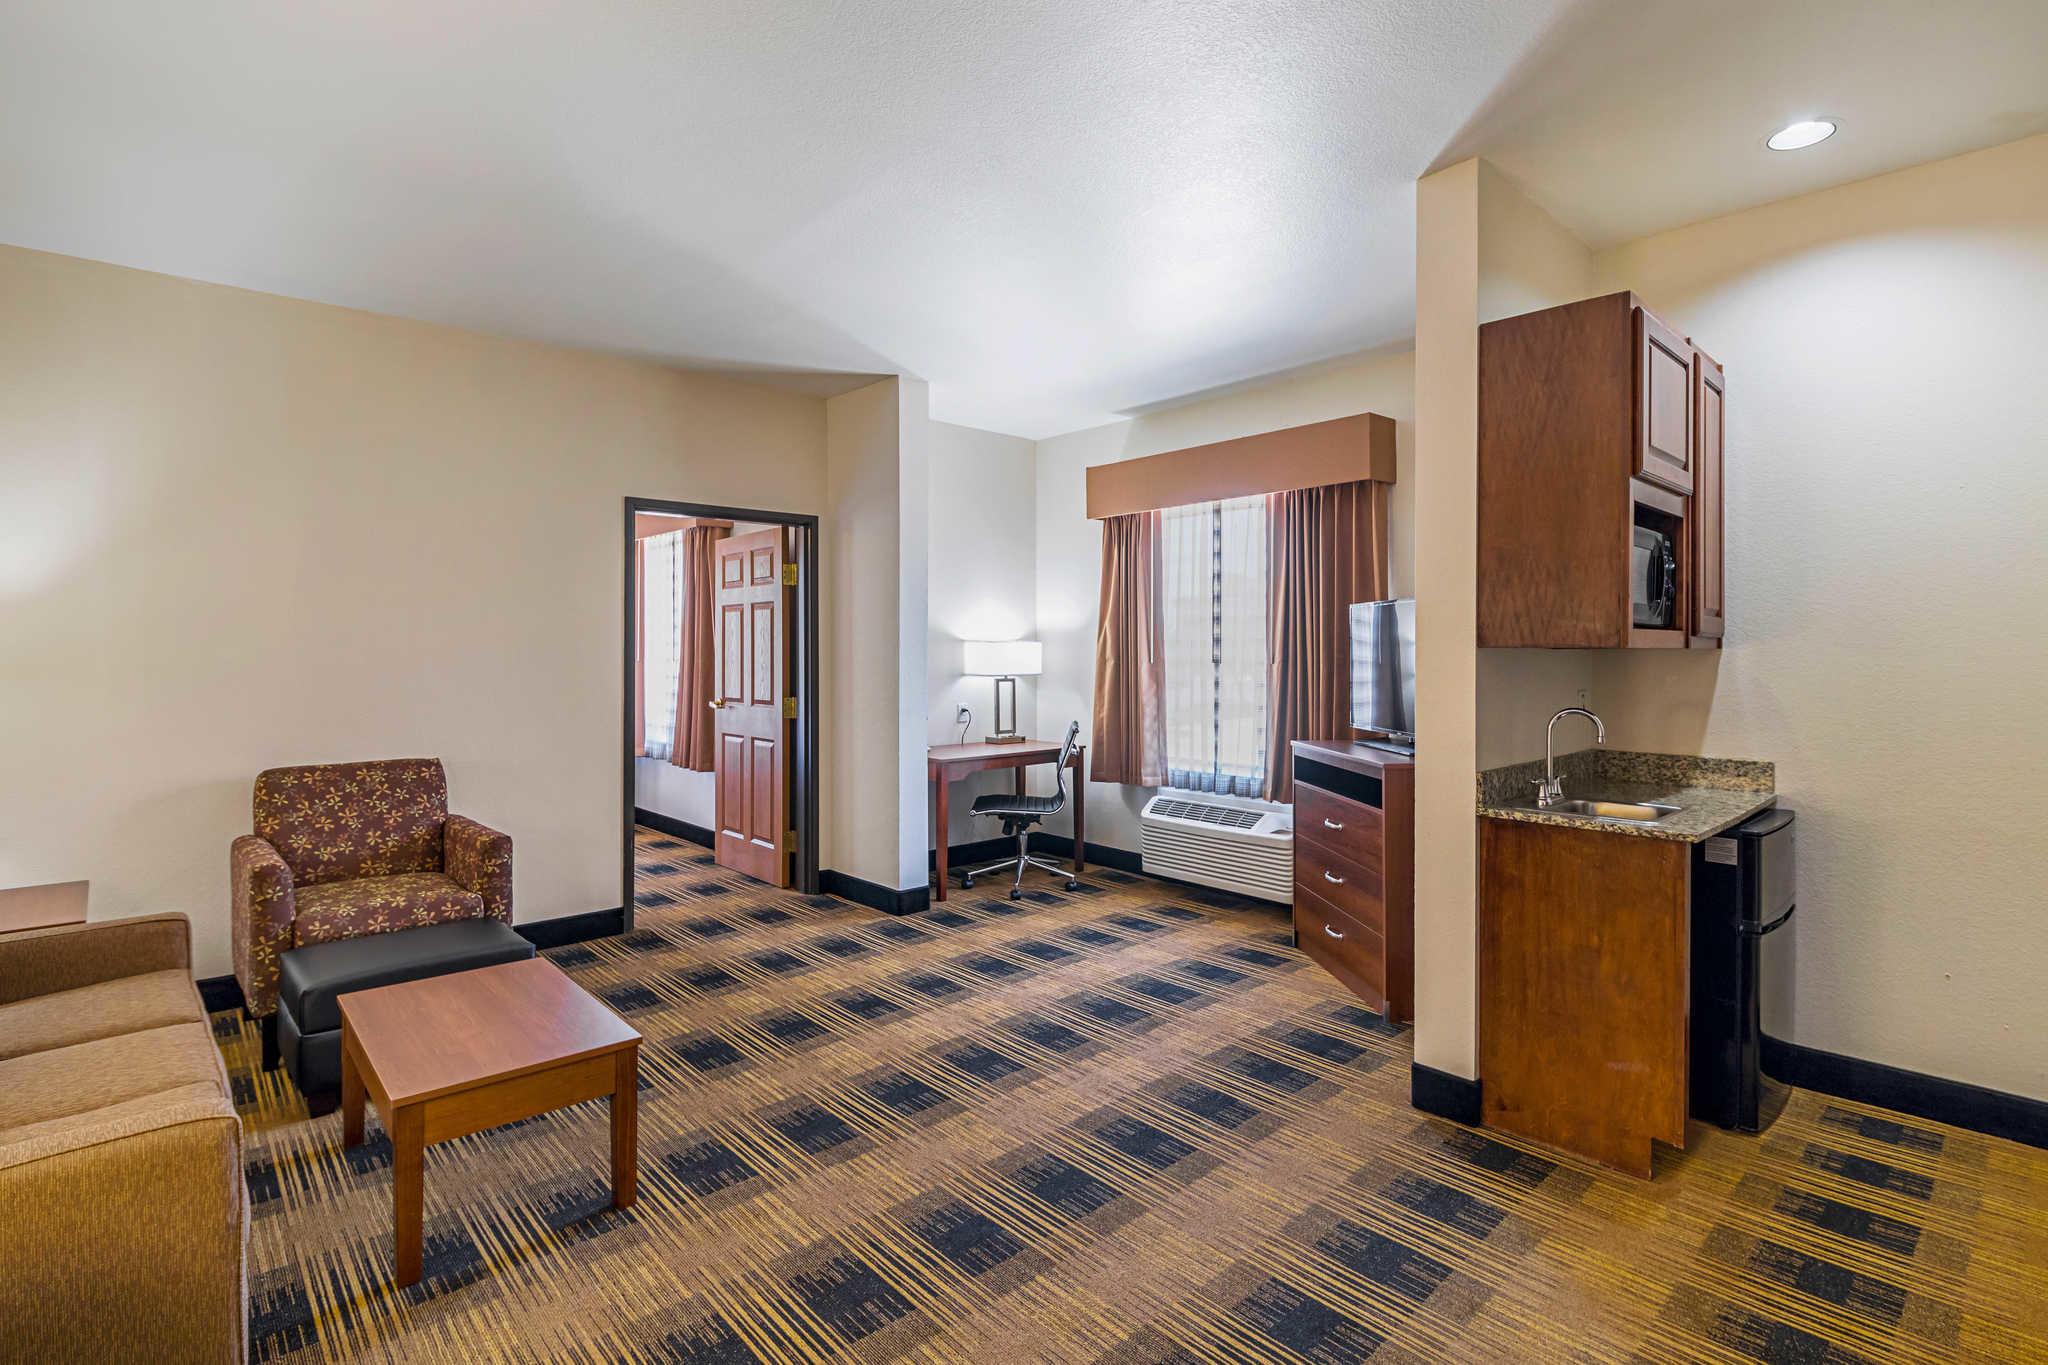 Quality Inn & Suites image 36